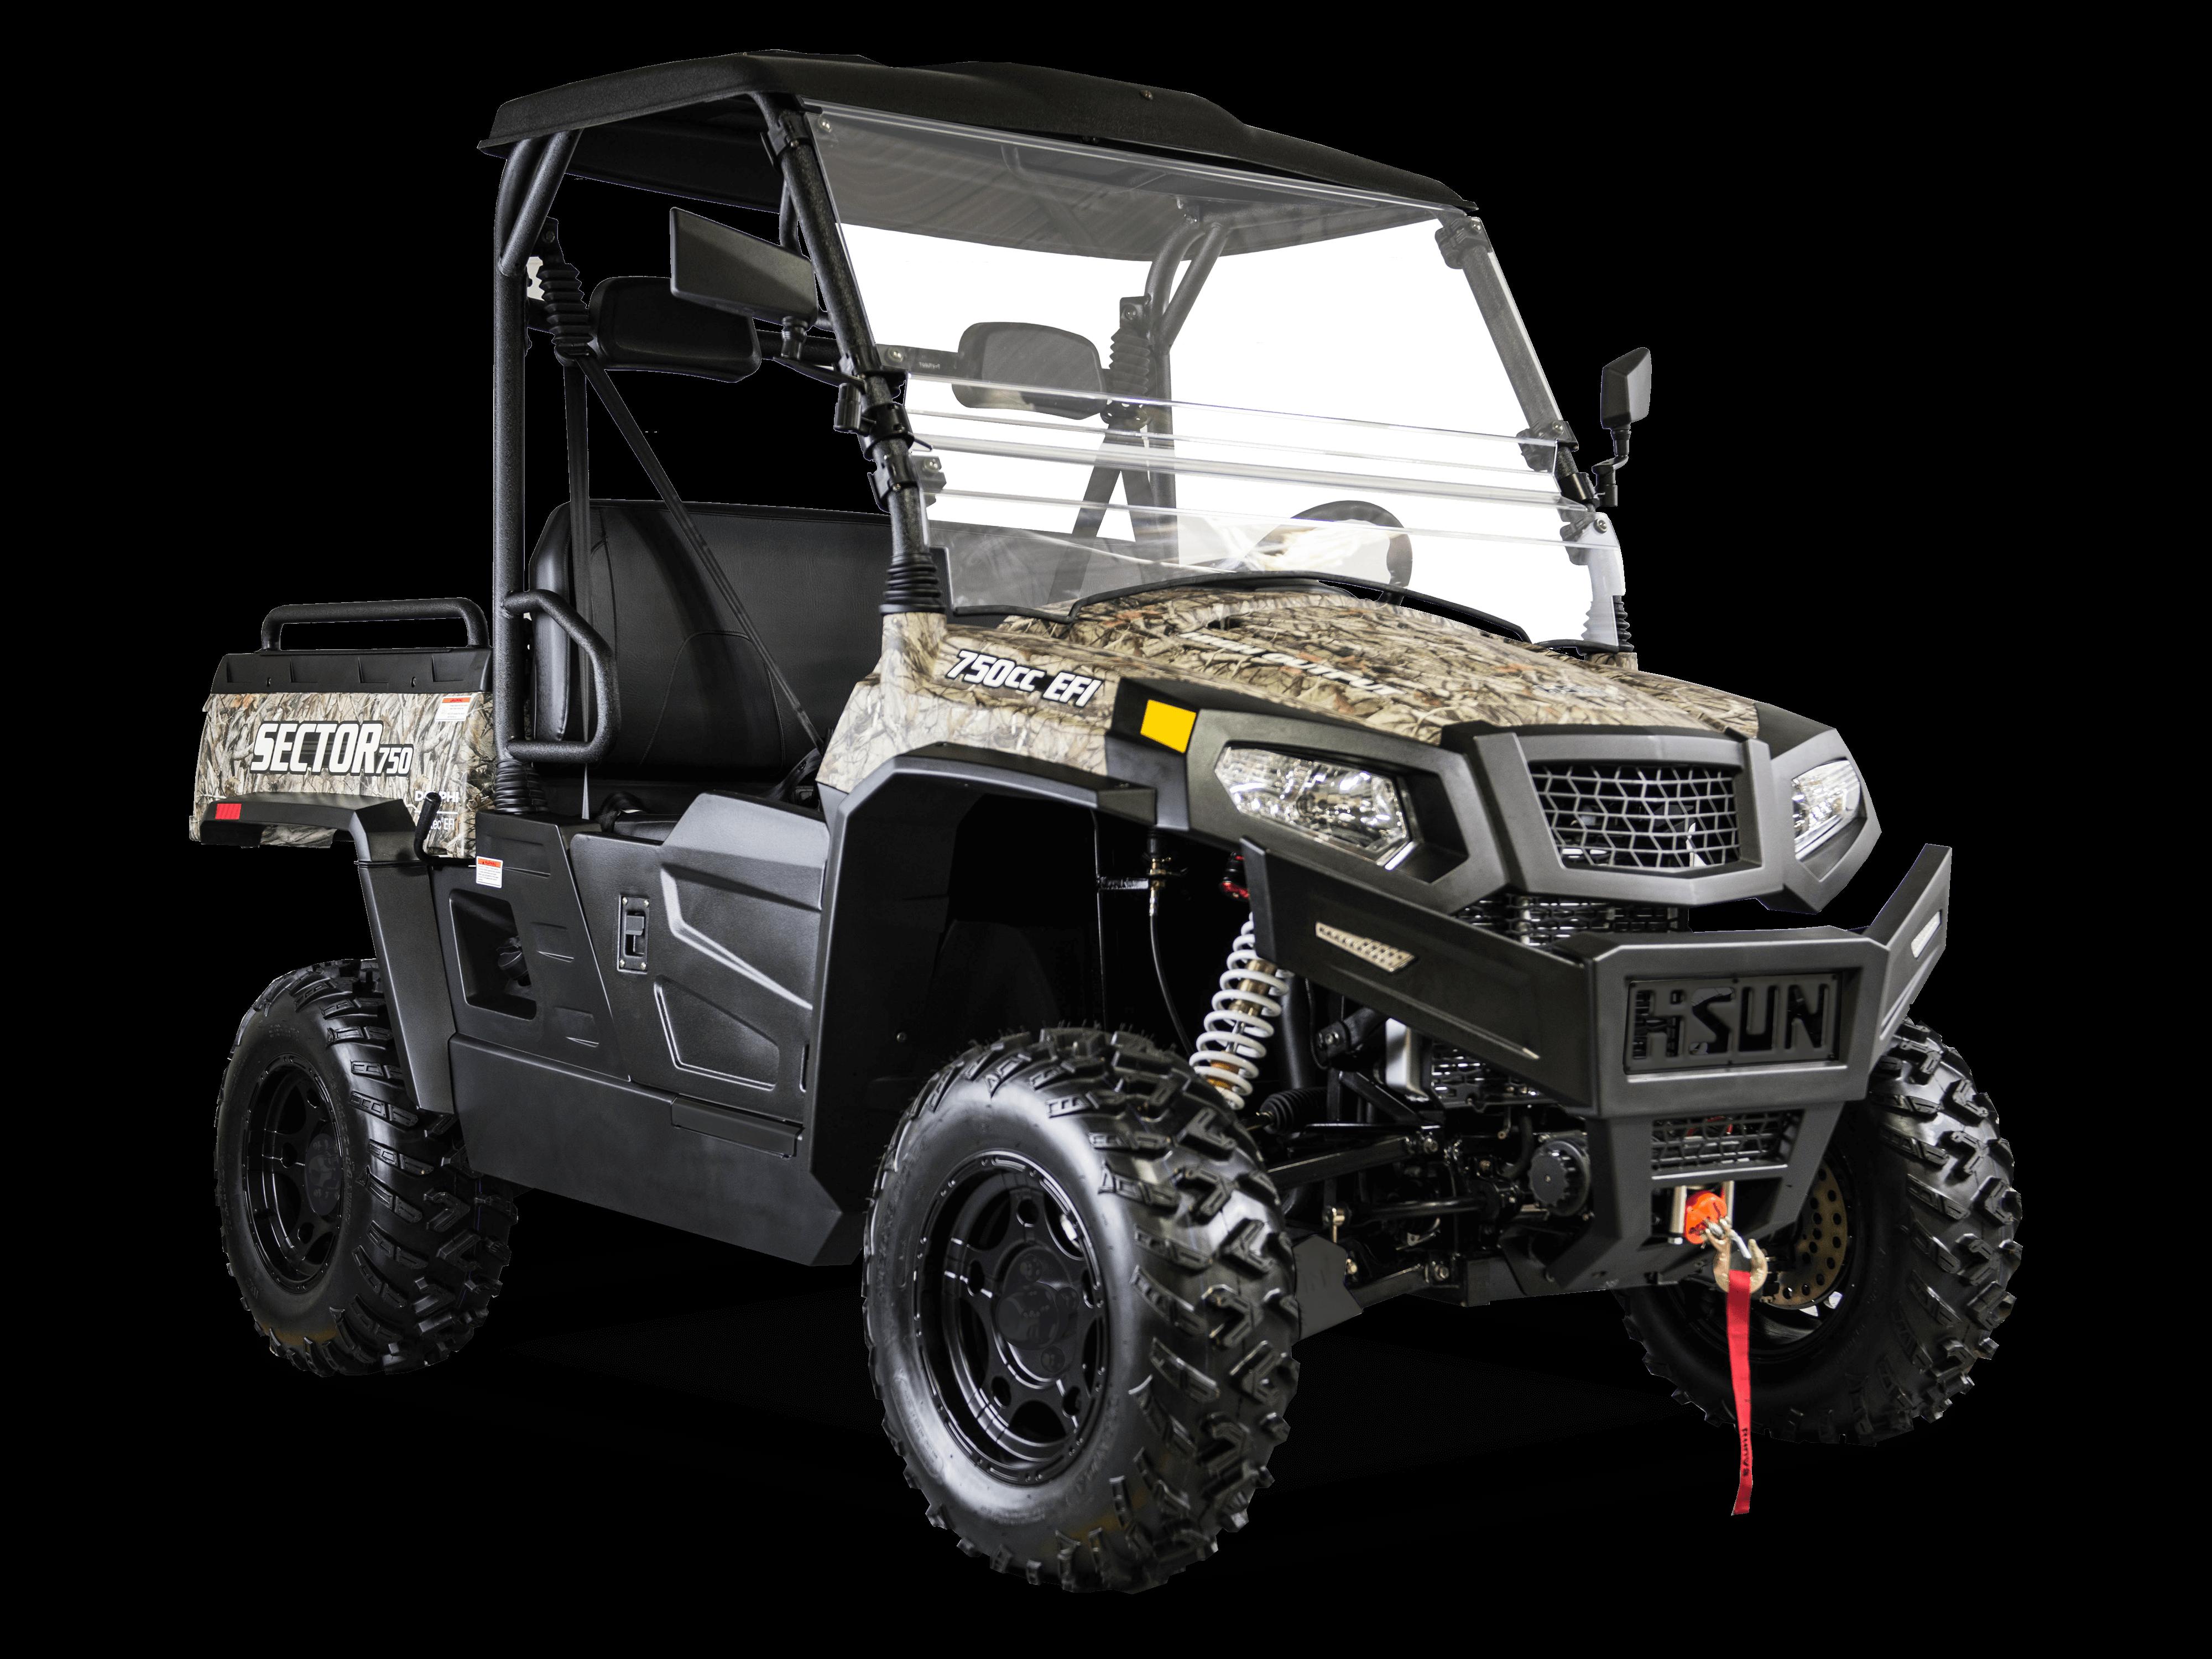 Hisun Motors   Sector   SECTOR 750